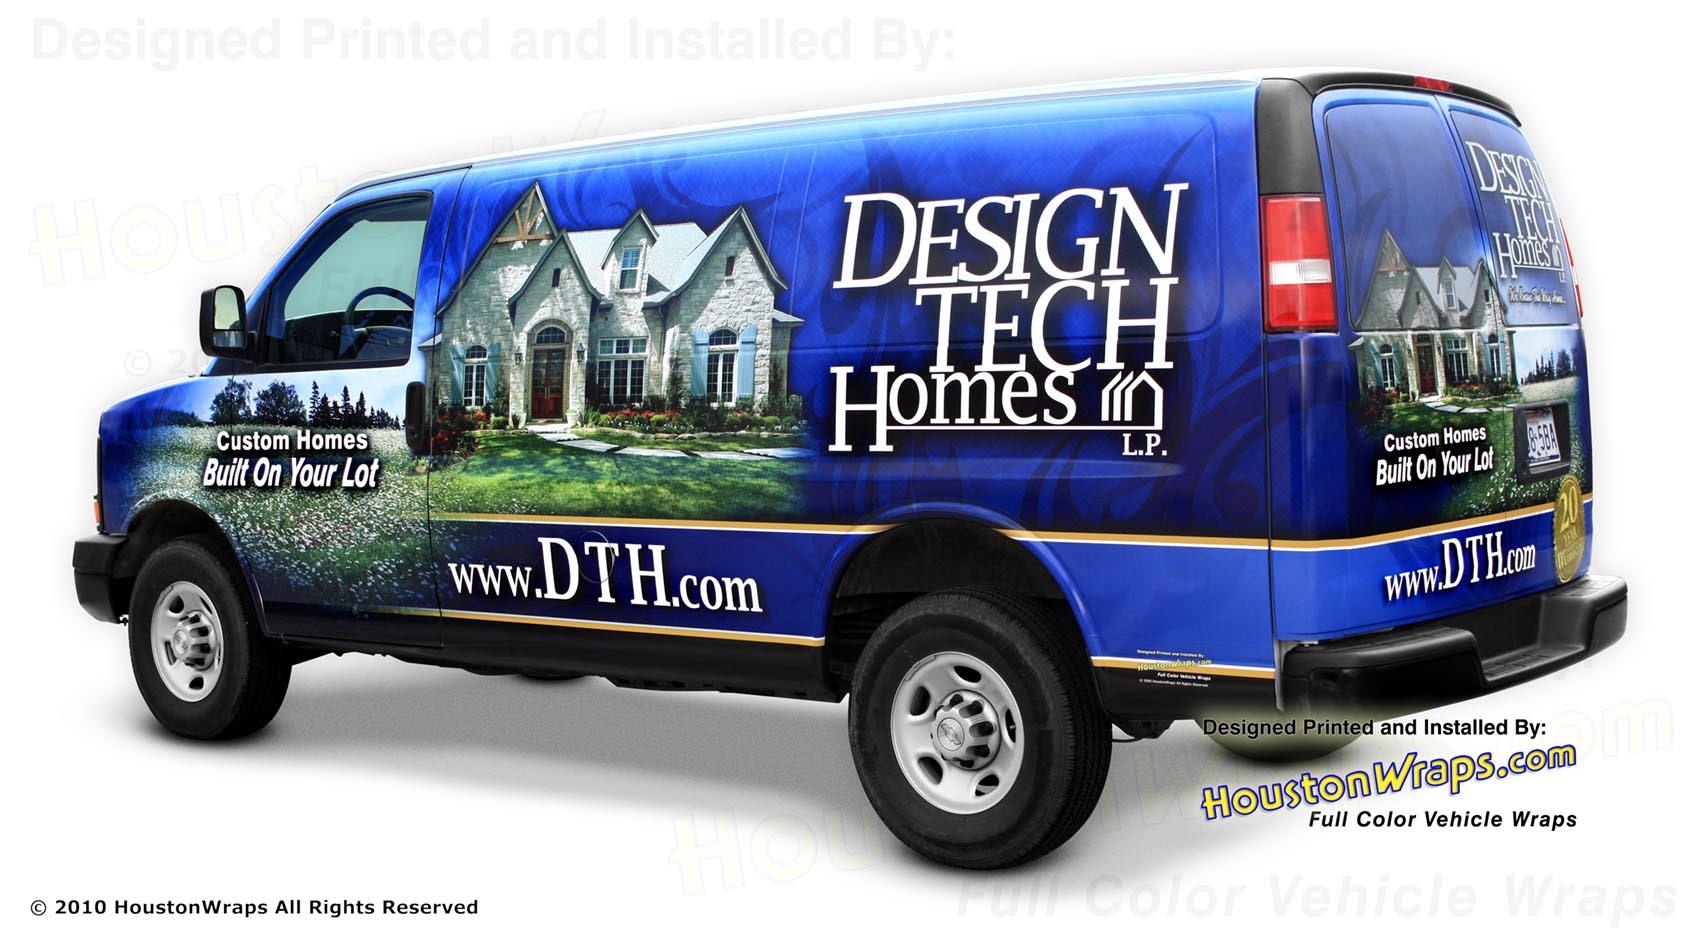 Houston Wraps Van Wrap Design Tech Homes